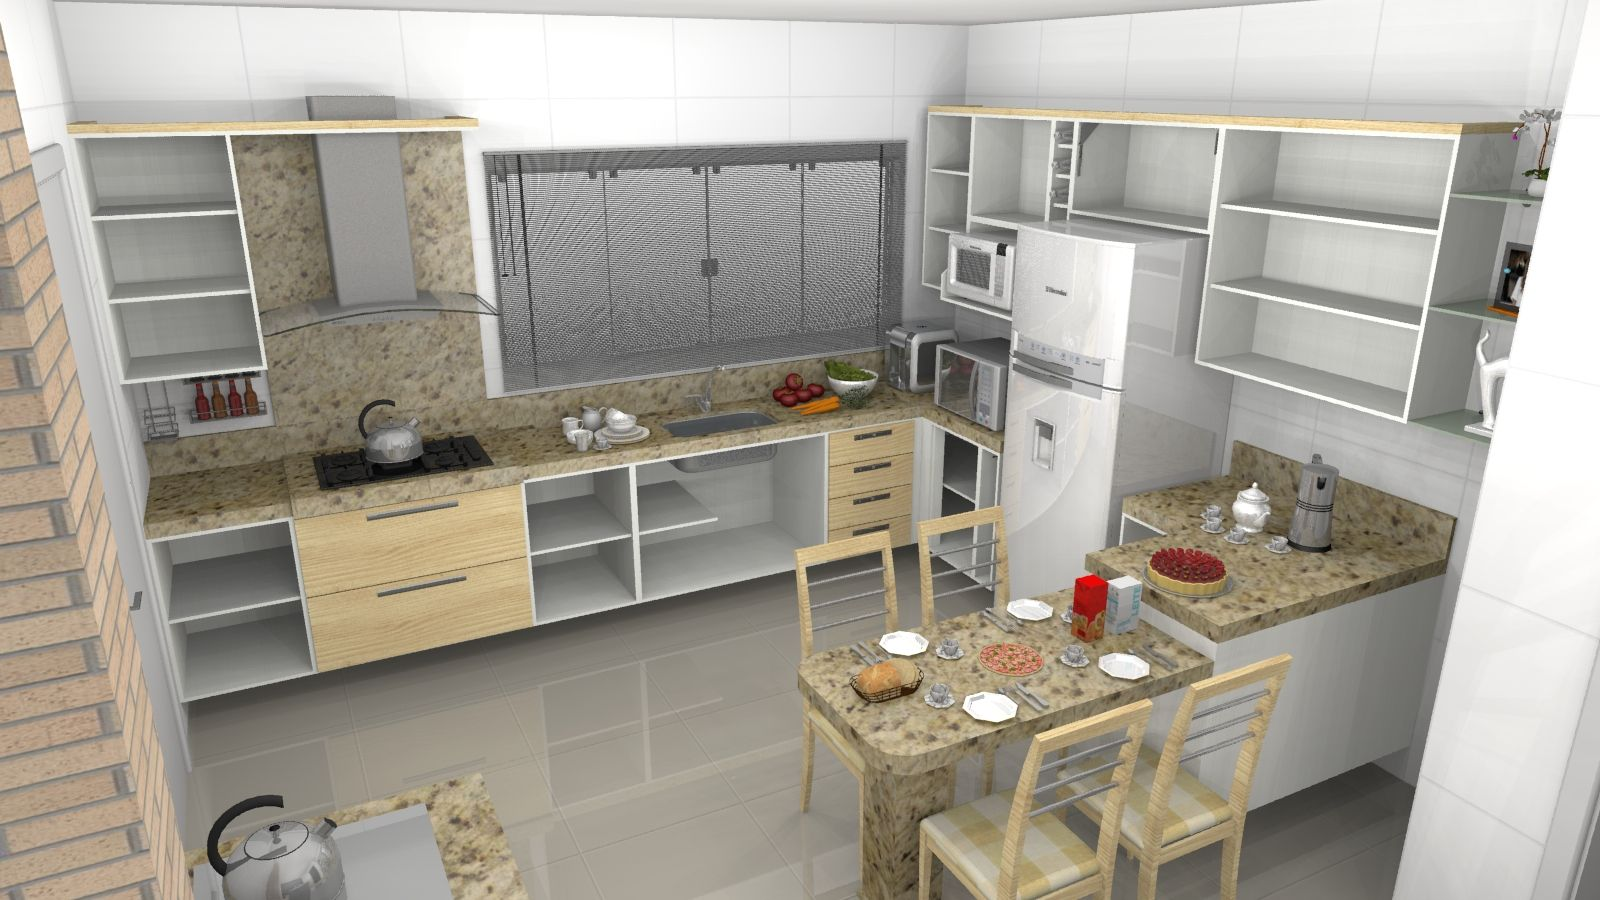 Cozinha Planejada 230 1 Jpg Imagem Jpeg 1600 900 Pixels